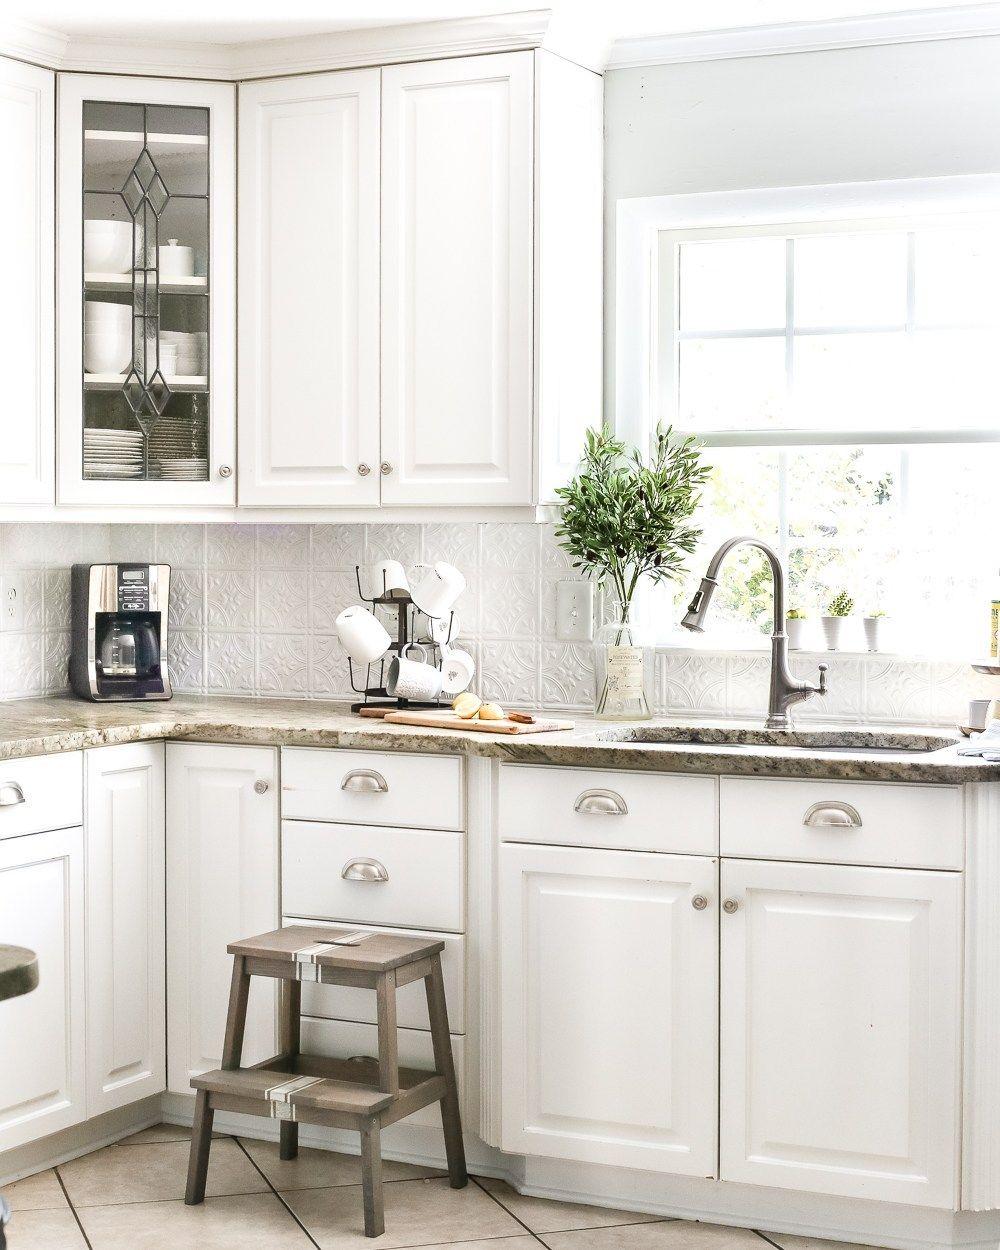 Diy Pressed Tin Kitchen Backsplash Bless Er House In 2020 Green Kitchen Cabinets Kitchen Cabinet Inspiration Kitchen Design Diy